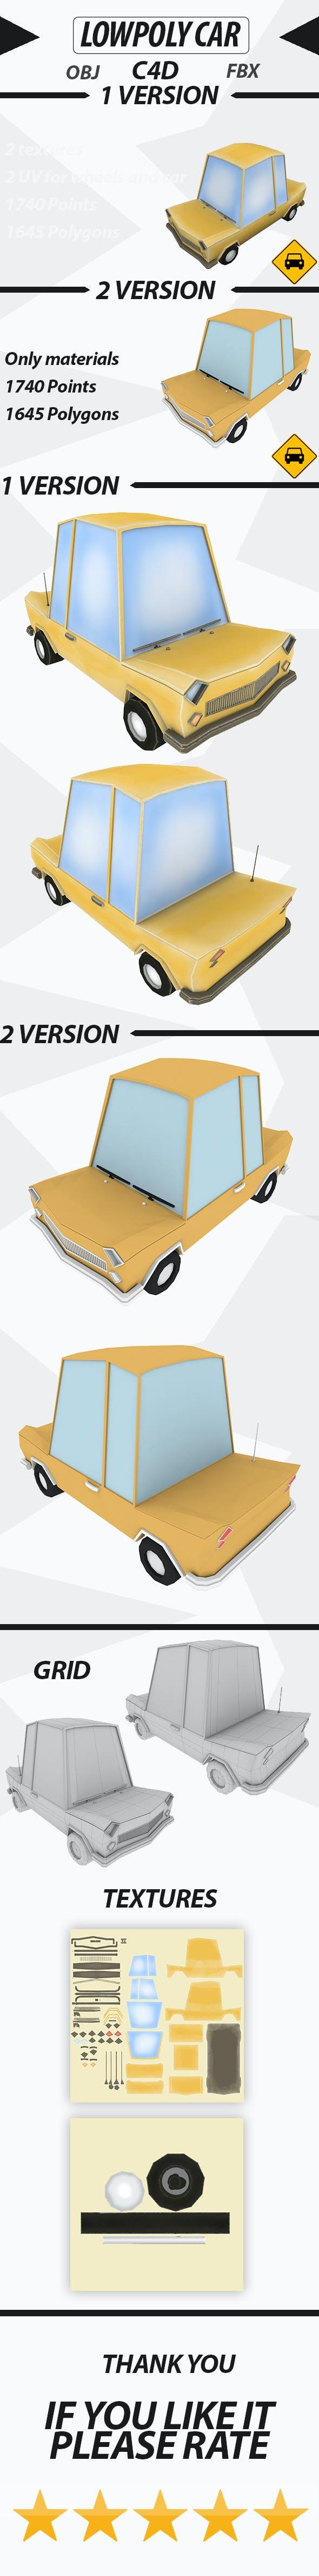 Lowpoly car - 3DOcean Item for Sale